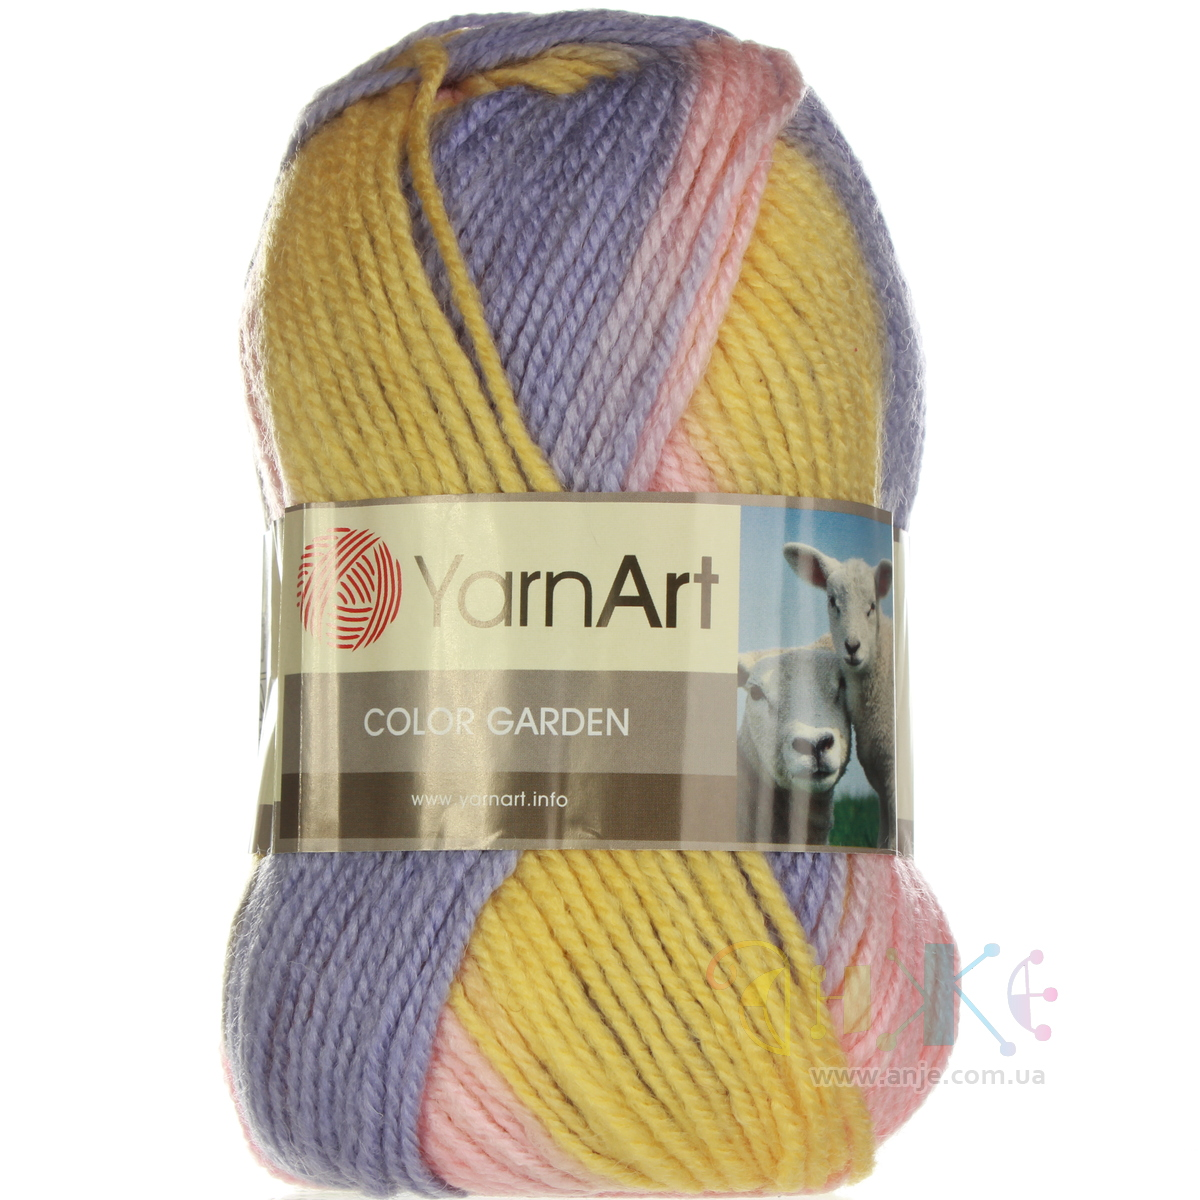 Yarn art color garden -  Yarnart Color Garden 54 A Href I C Good 75 94 75941070_download Jpg Style Float Right A